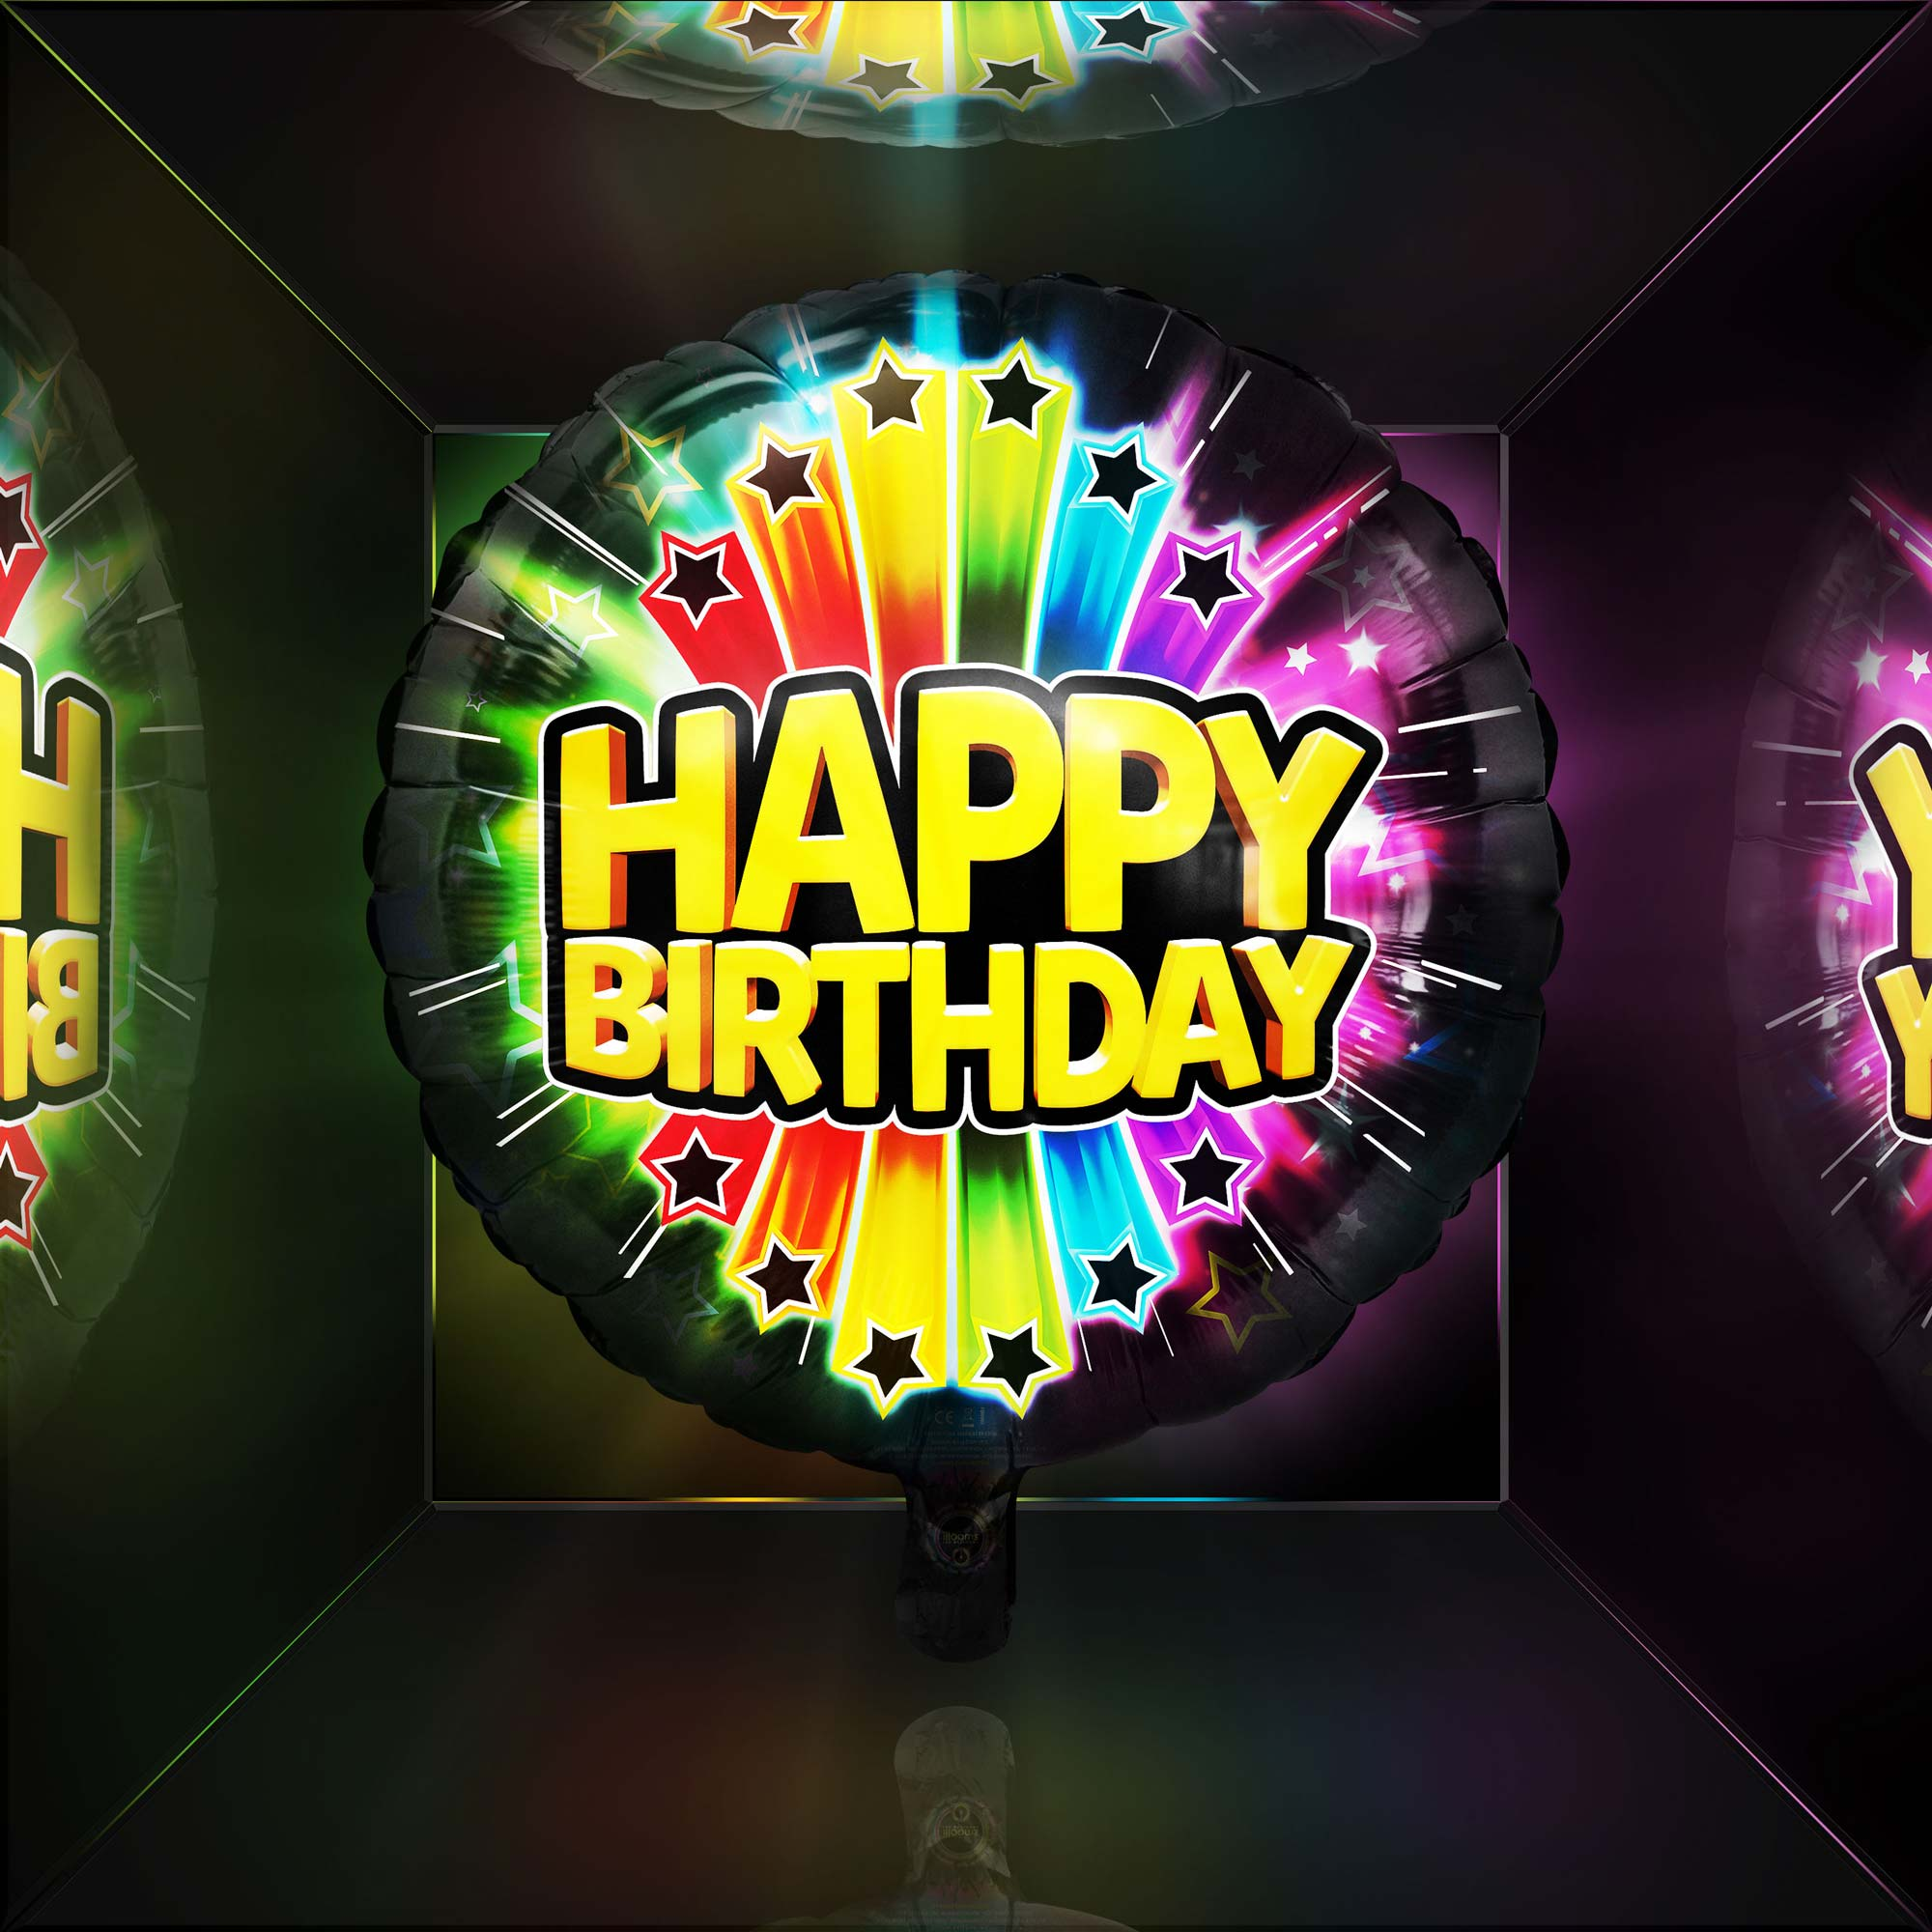 Happy Birthday Balloon at Night